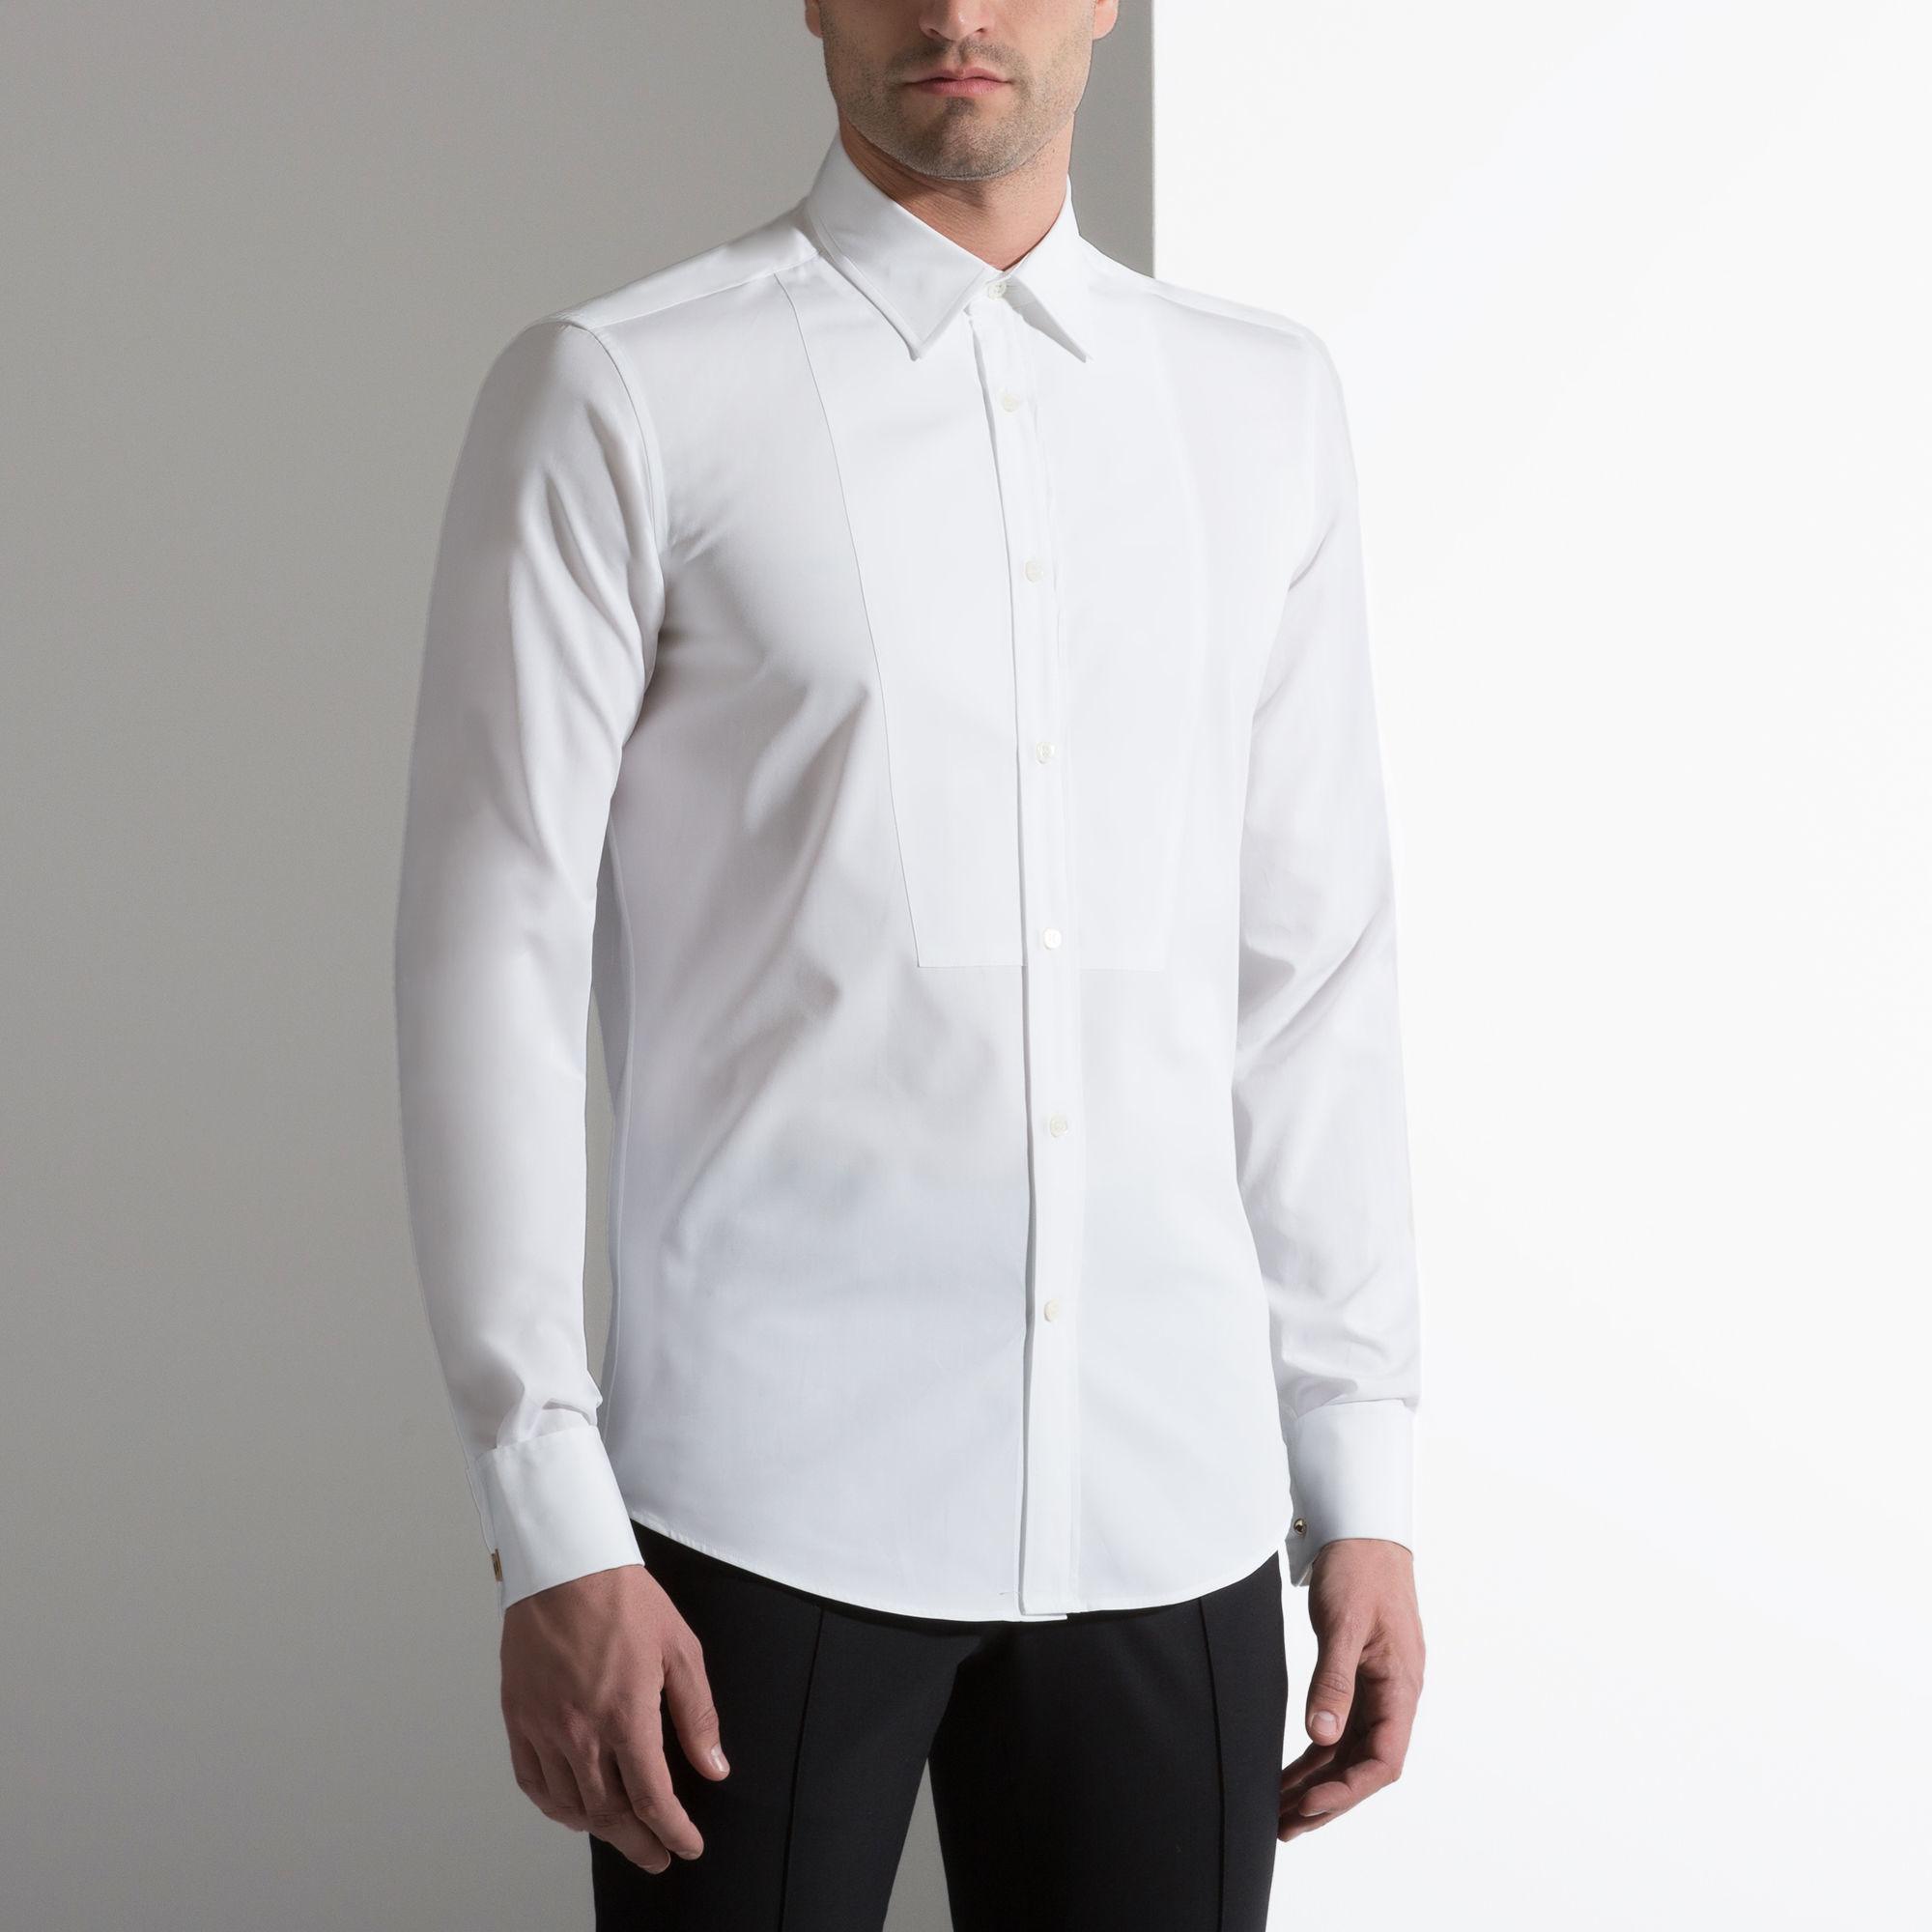 Lyst Bally Cotton Dress Shirt M5ba197f 7s111 In White